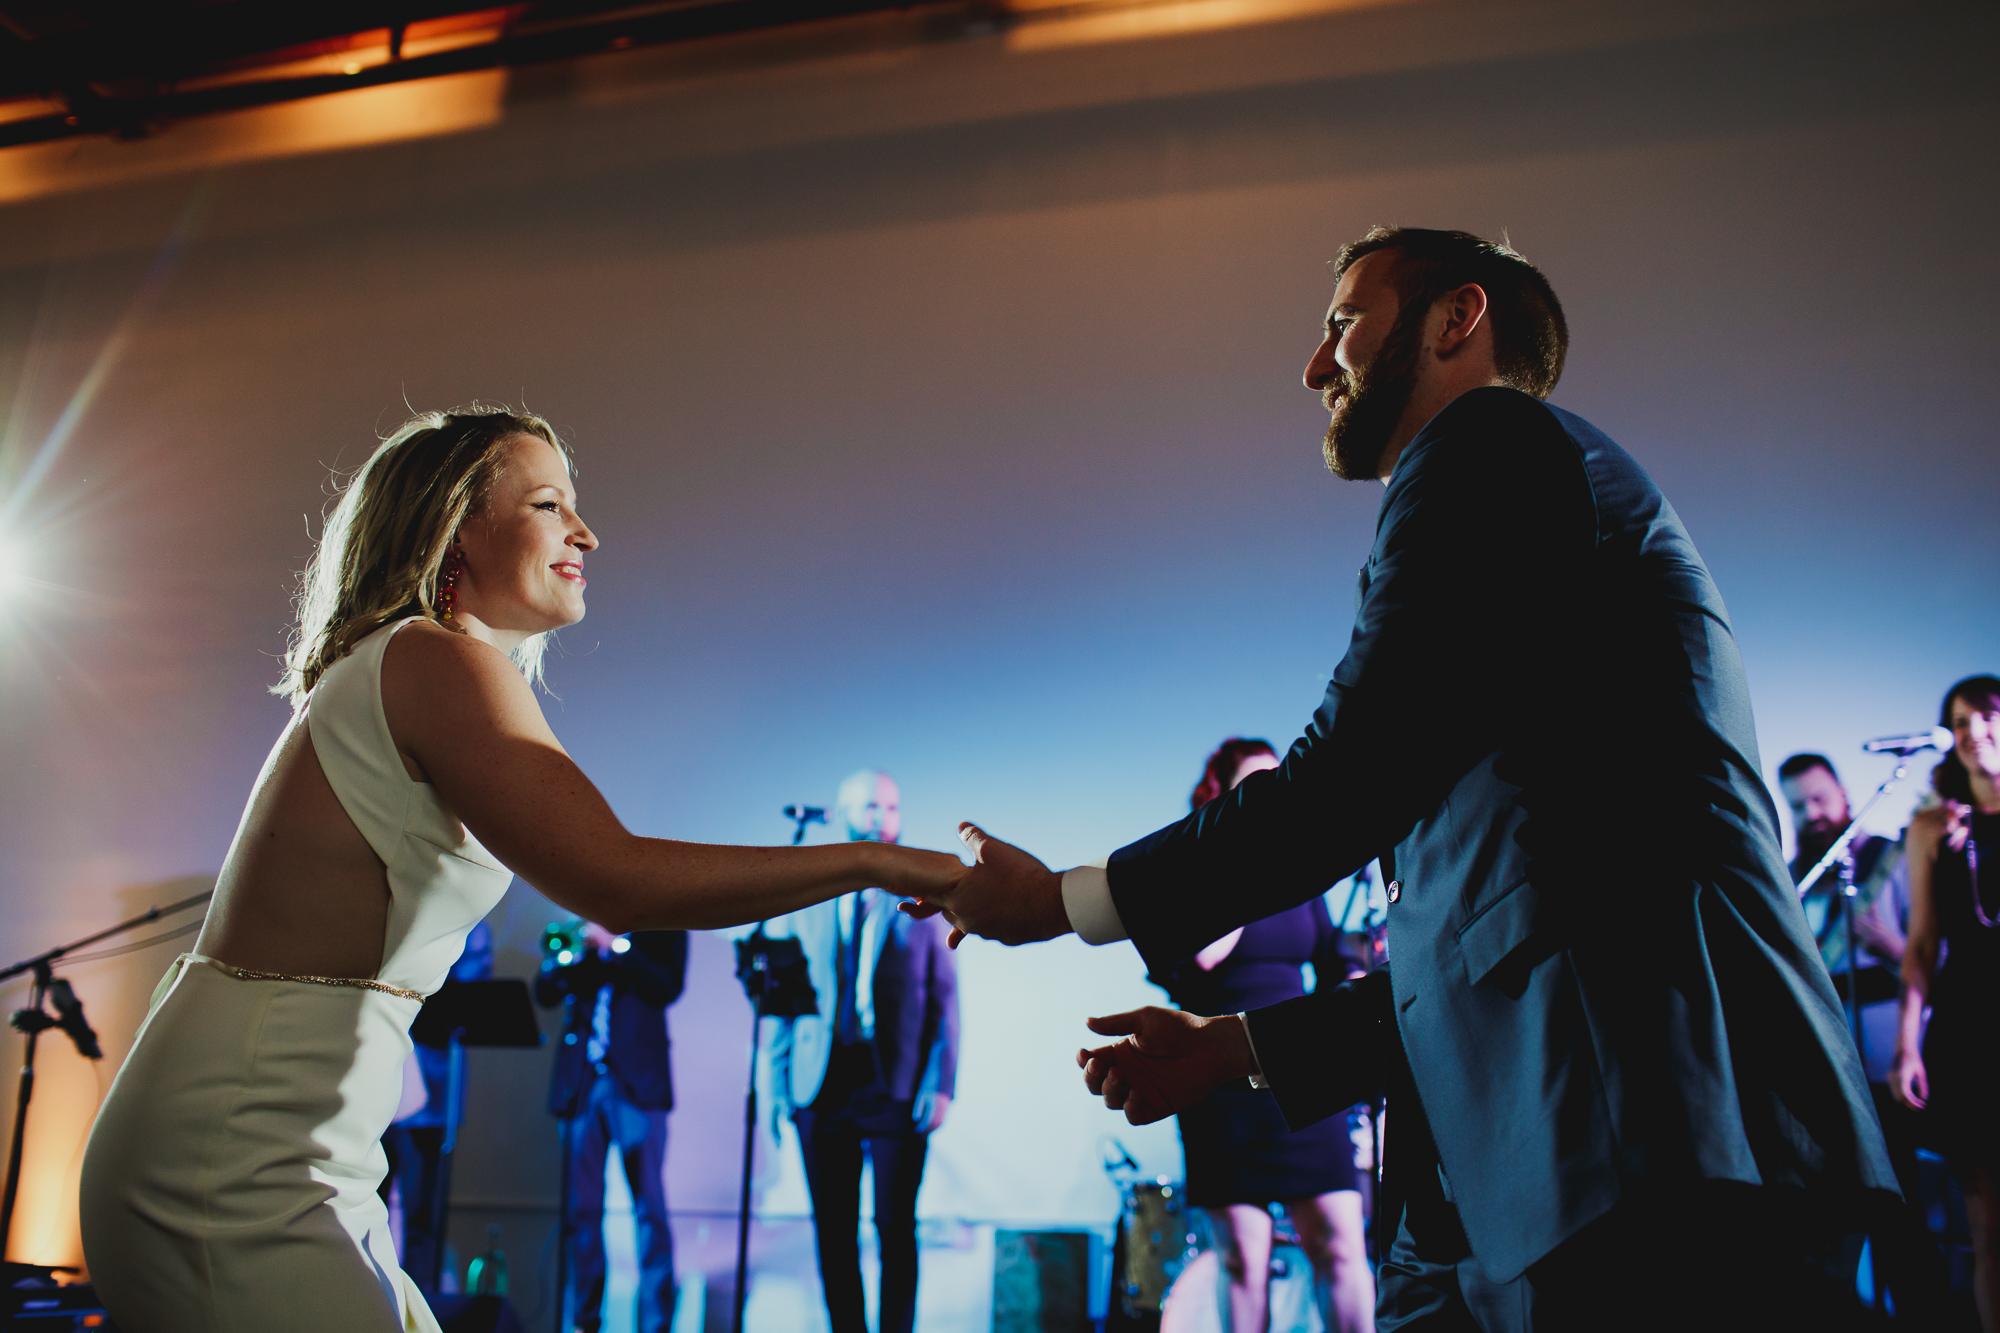 canvas event space wedding photos by Krista Welch-0094.jpg